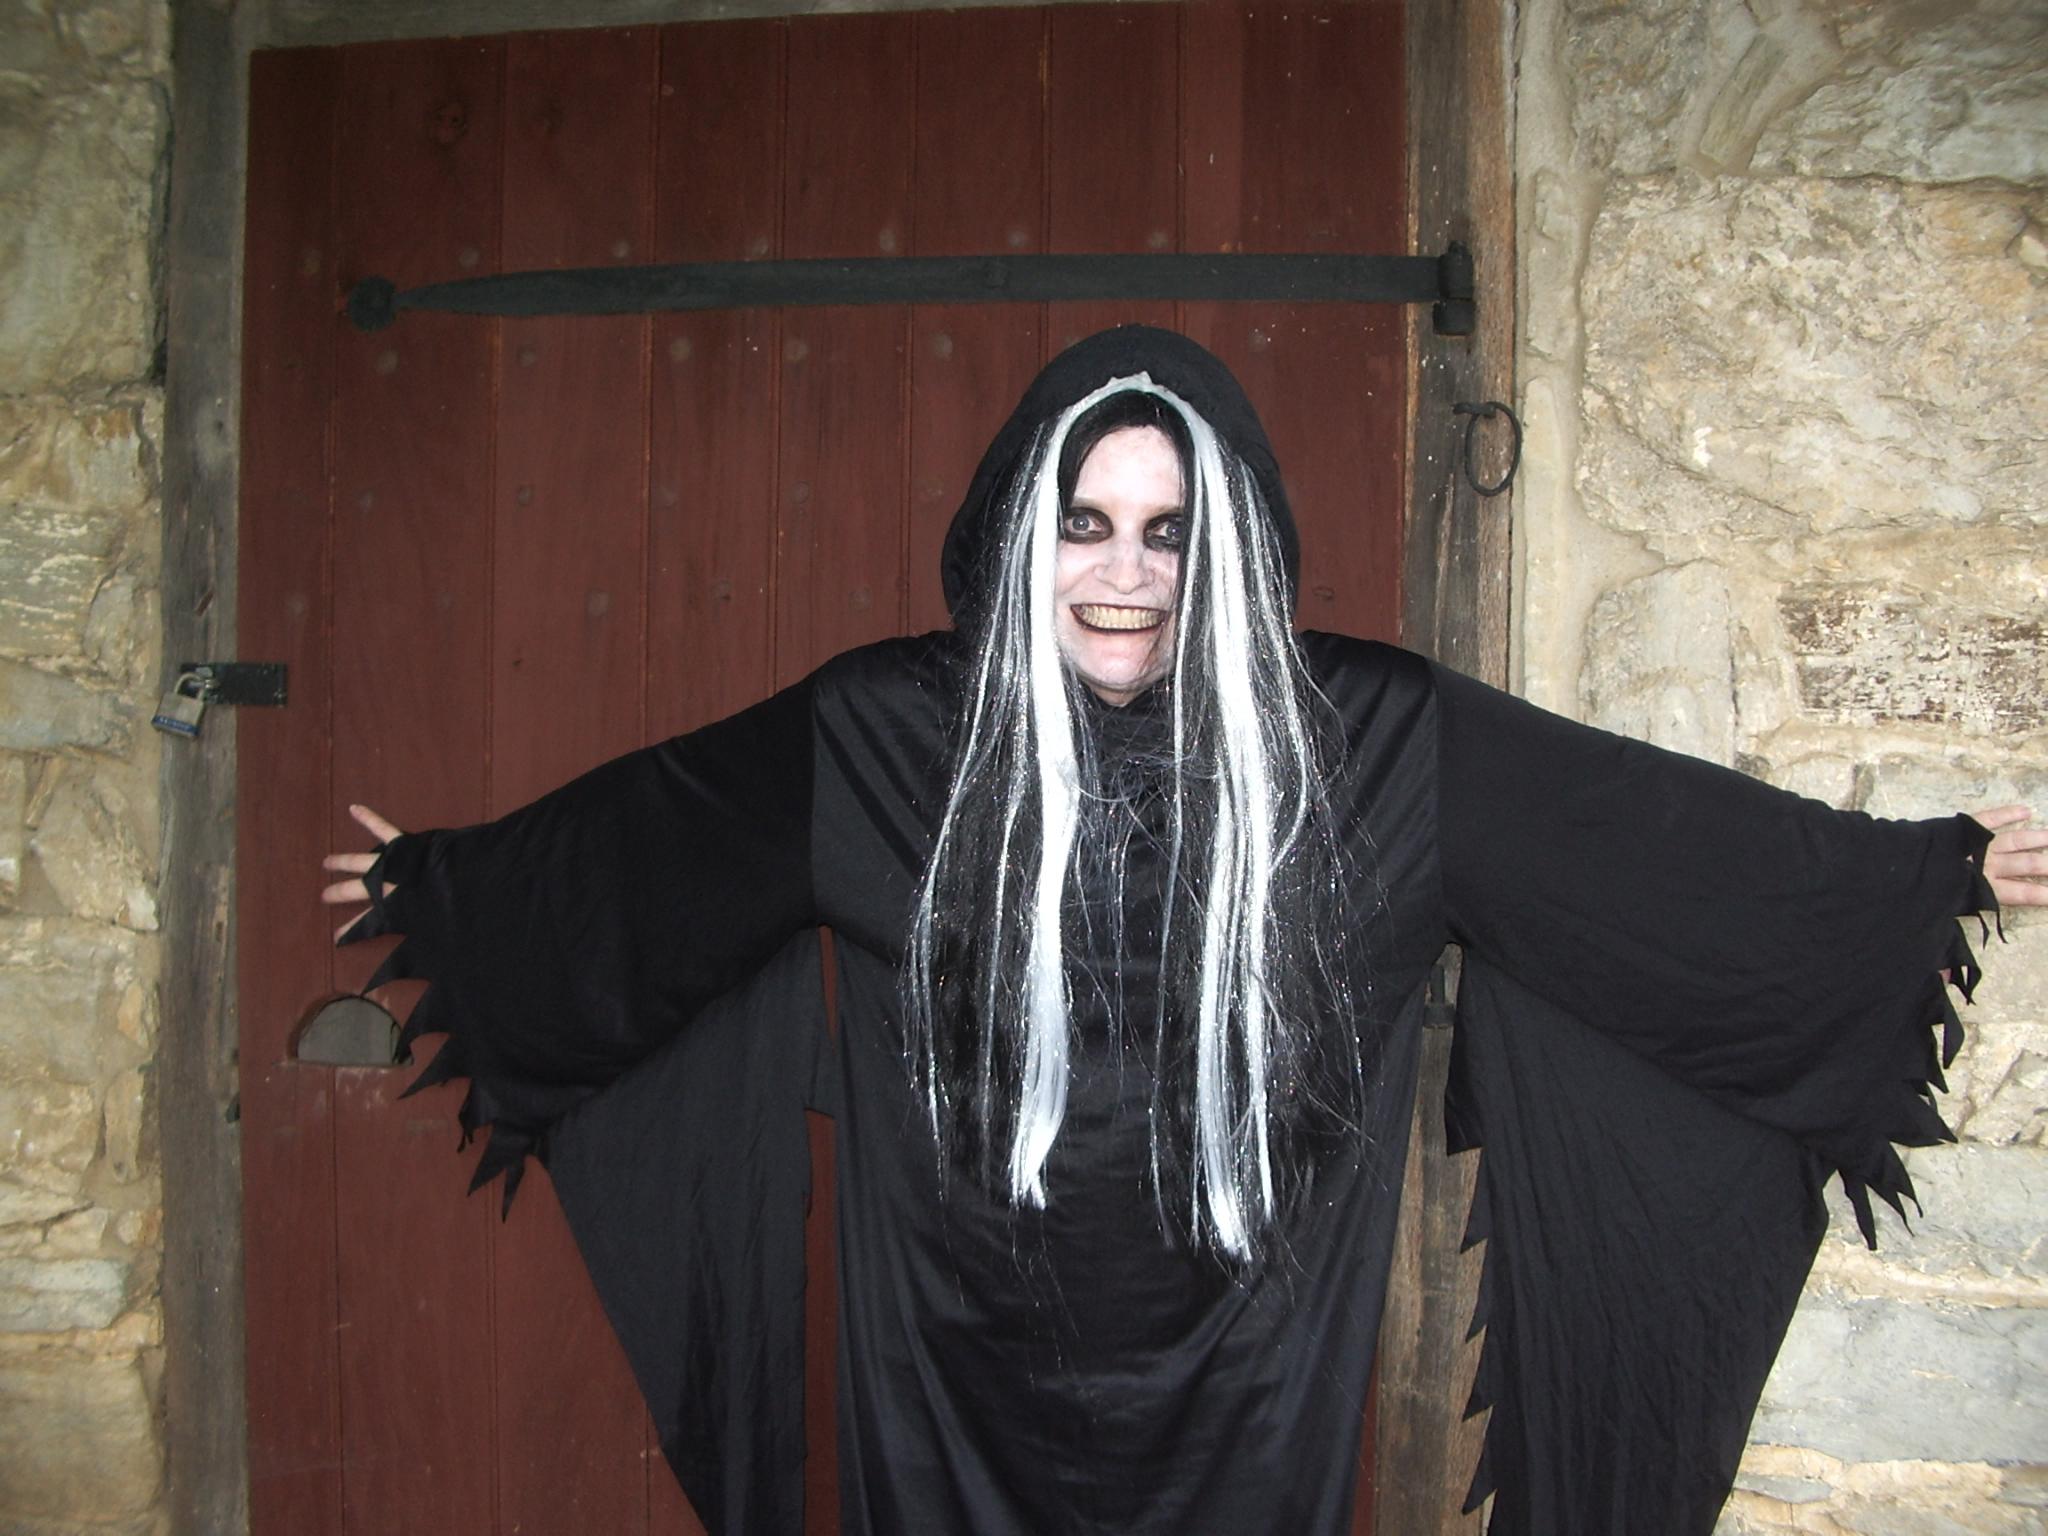 Teller of spooky tales, Jennifer Vanderau.